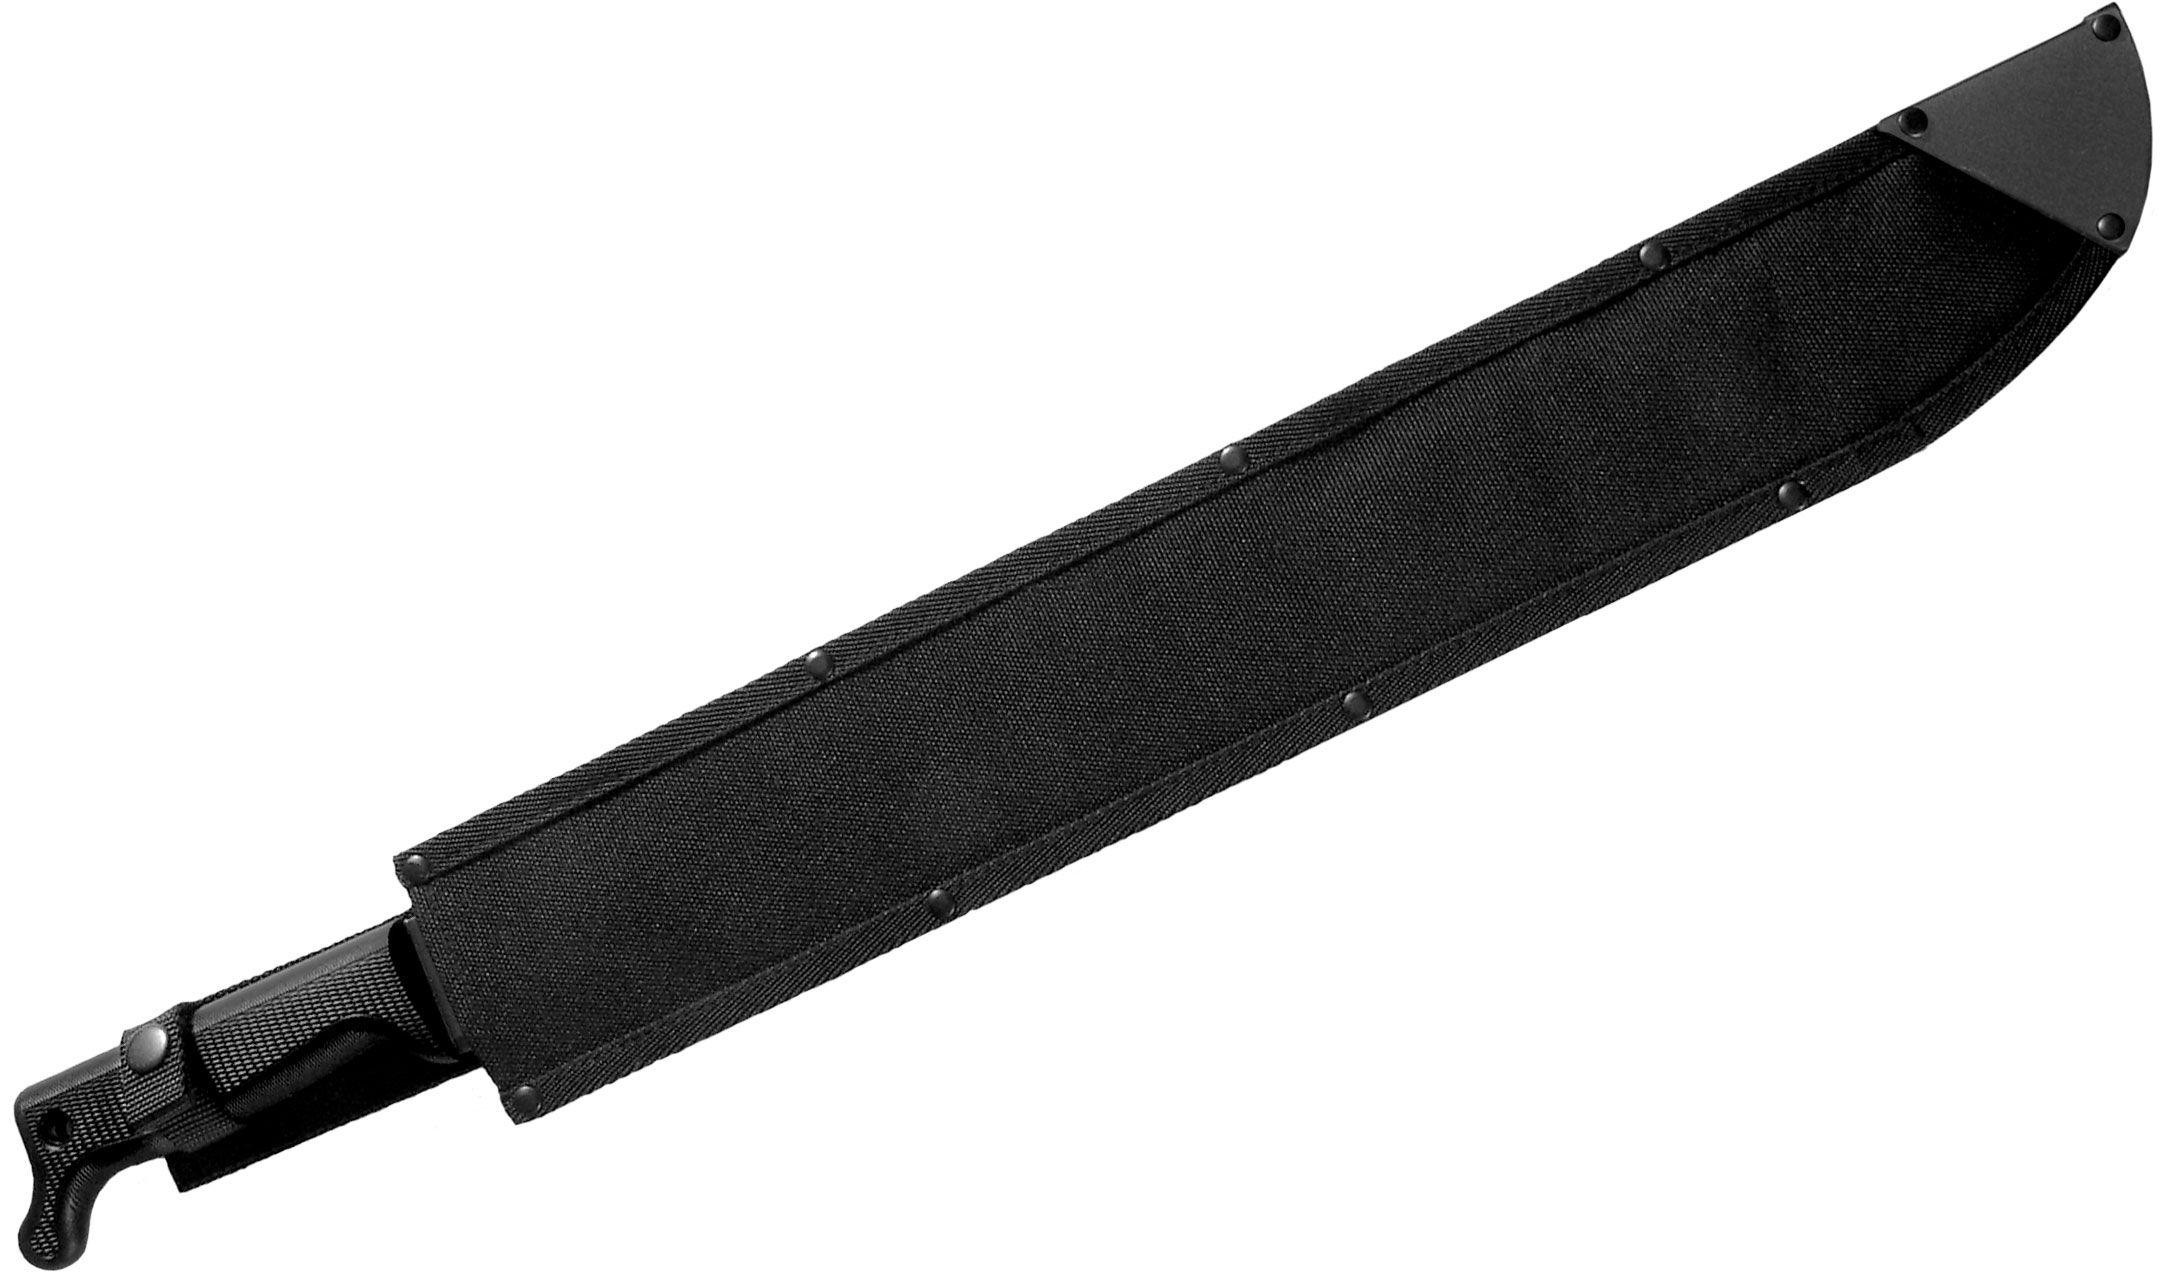 Cold Steel SC97AM21 Latin 21 inch Machete Sheath